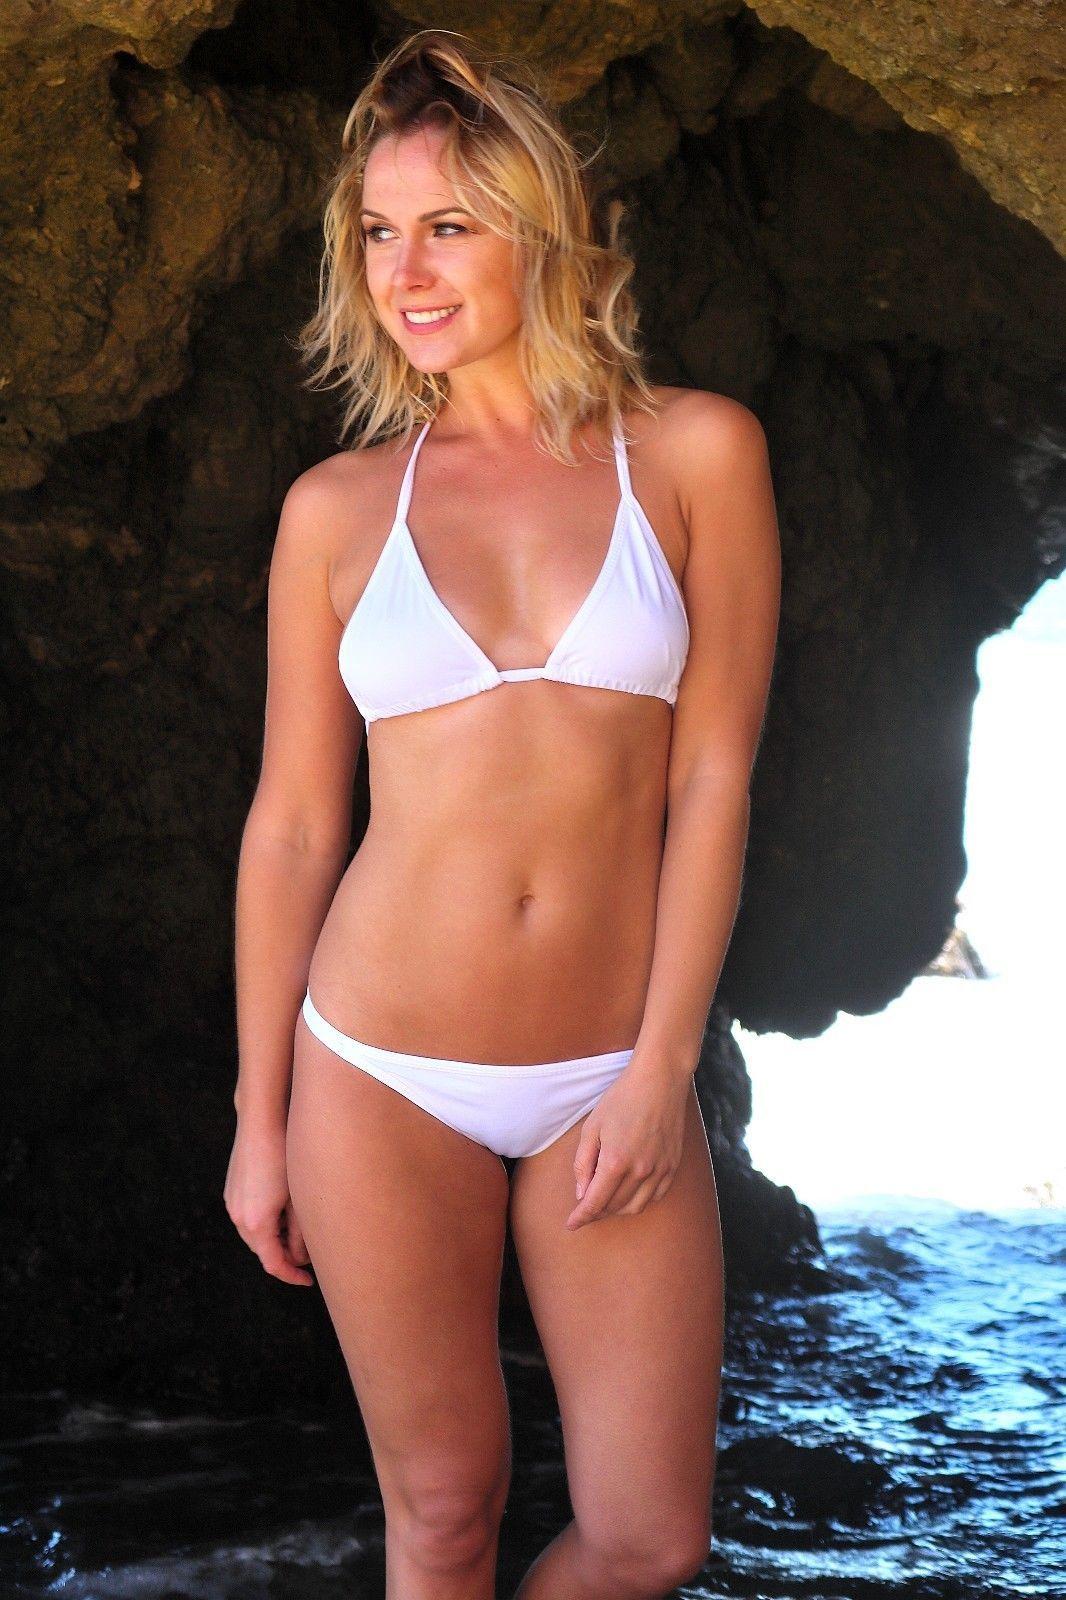 8167f822bfc Triangle Bikini White Bikini Sexy Bikini Cute Bikinis Girls Swimsuits  Swimwear White Two Piece, Cute